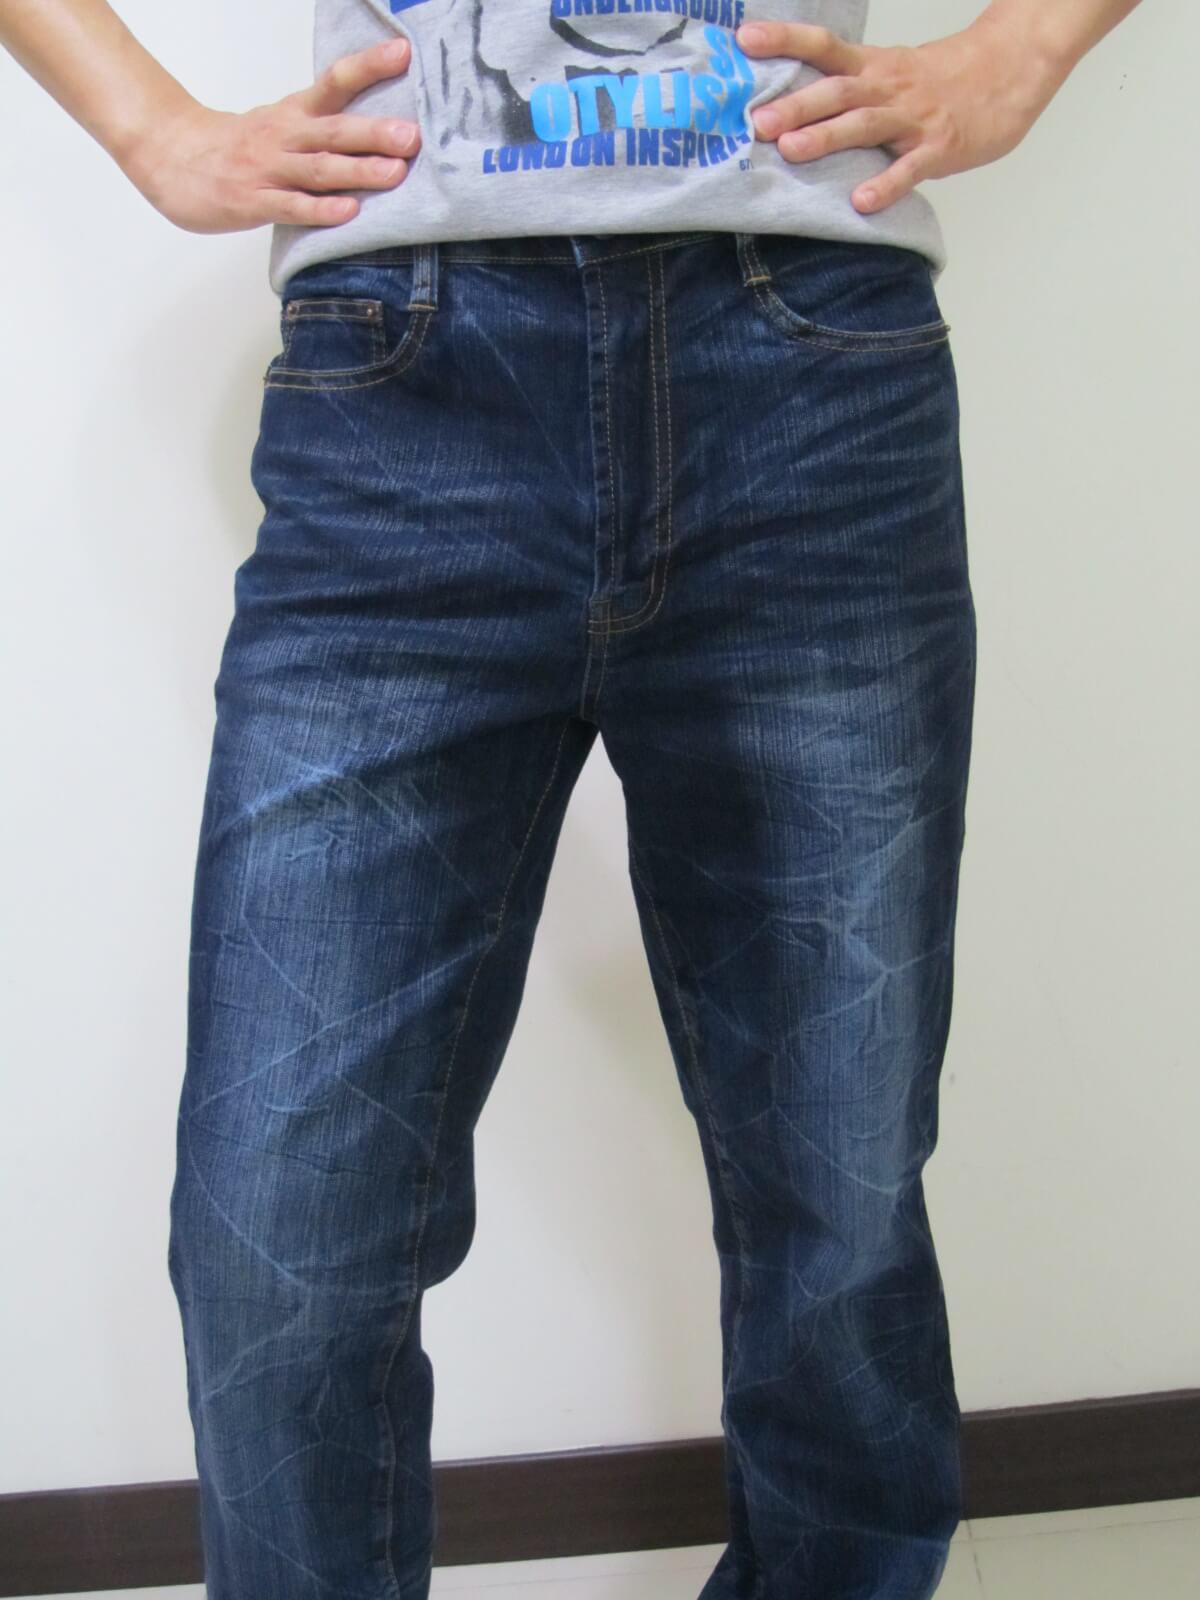 sun-e台灣製造牛仔長褲、伸縮直筒牛仔褲、台灣製單寧長褲(345-5876-31)深牛 腰圍:M L XL 2L 3L 4L (28~39)英吋 1